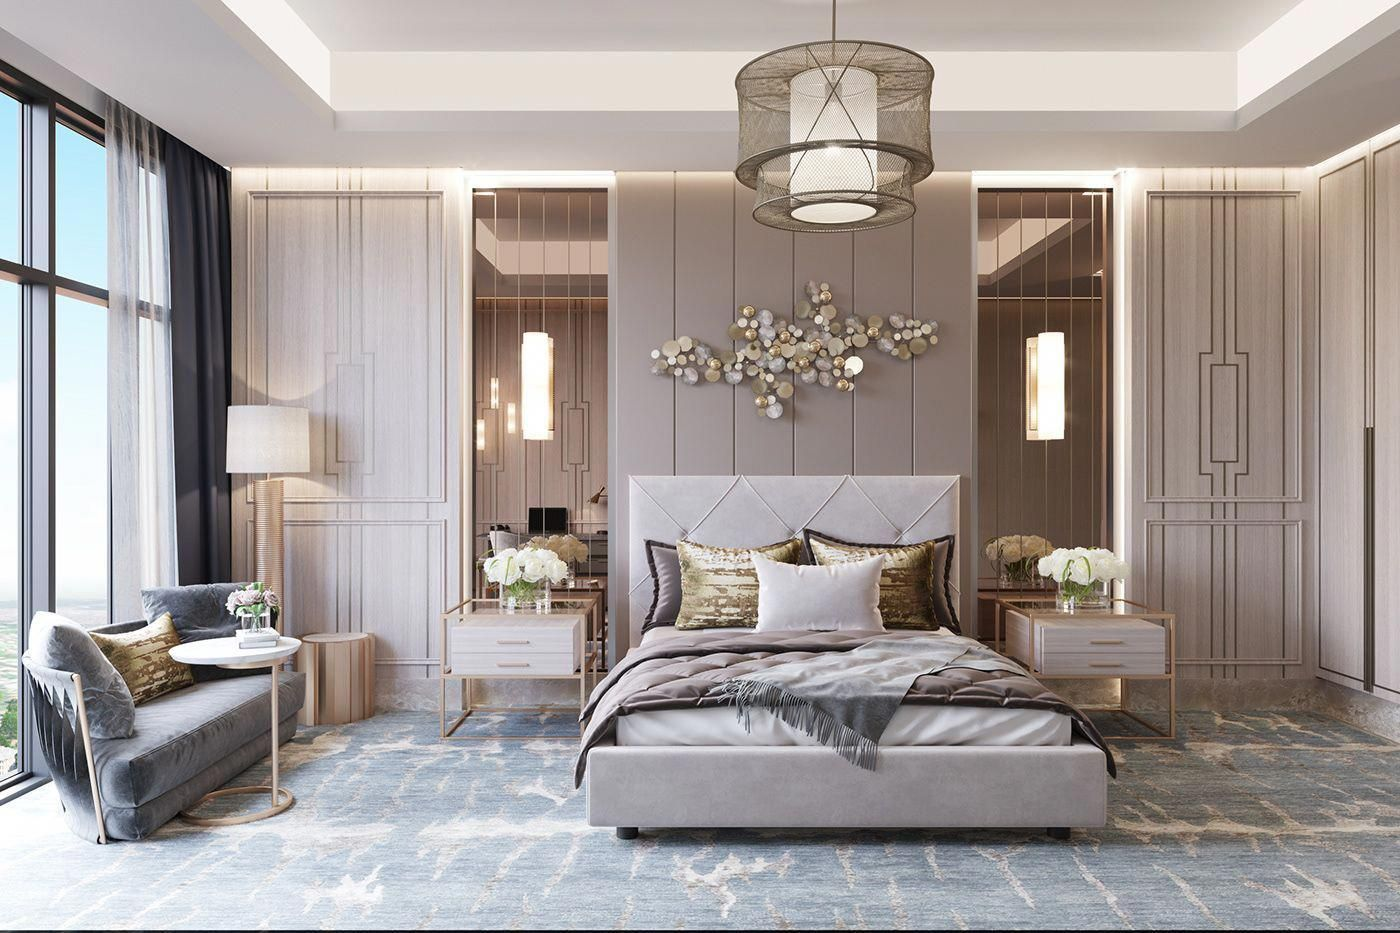 Green Bedroom Greenbedroom Kidsbedroom Apartmentbedroom In 2020 Modern Luxury Bedroom Luxurious Bedrooms Luxury Bedroom Master